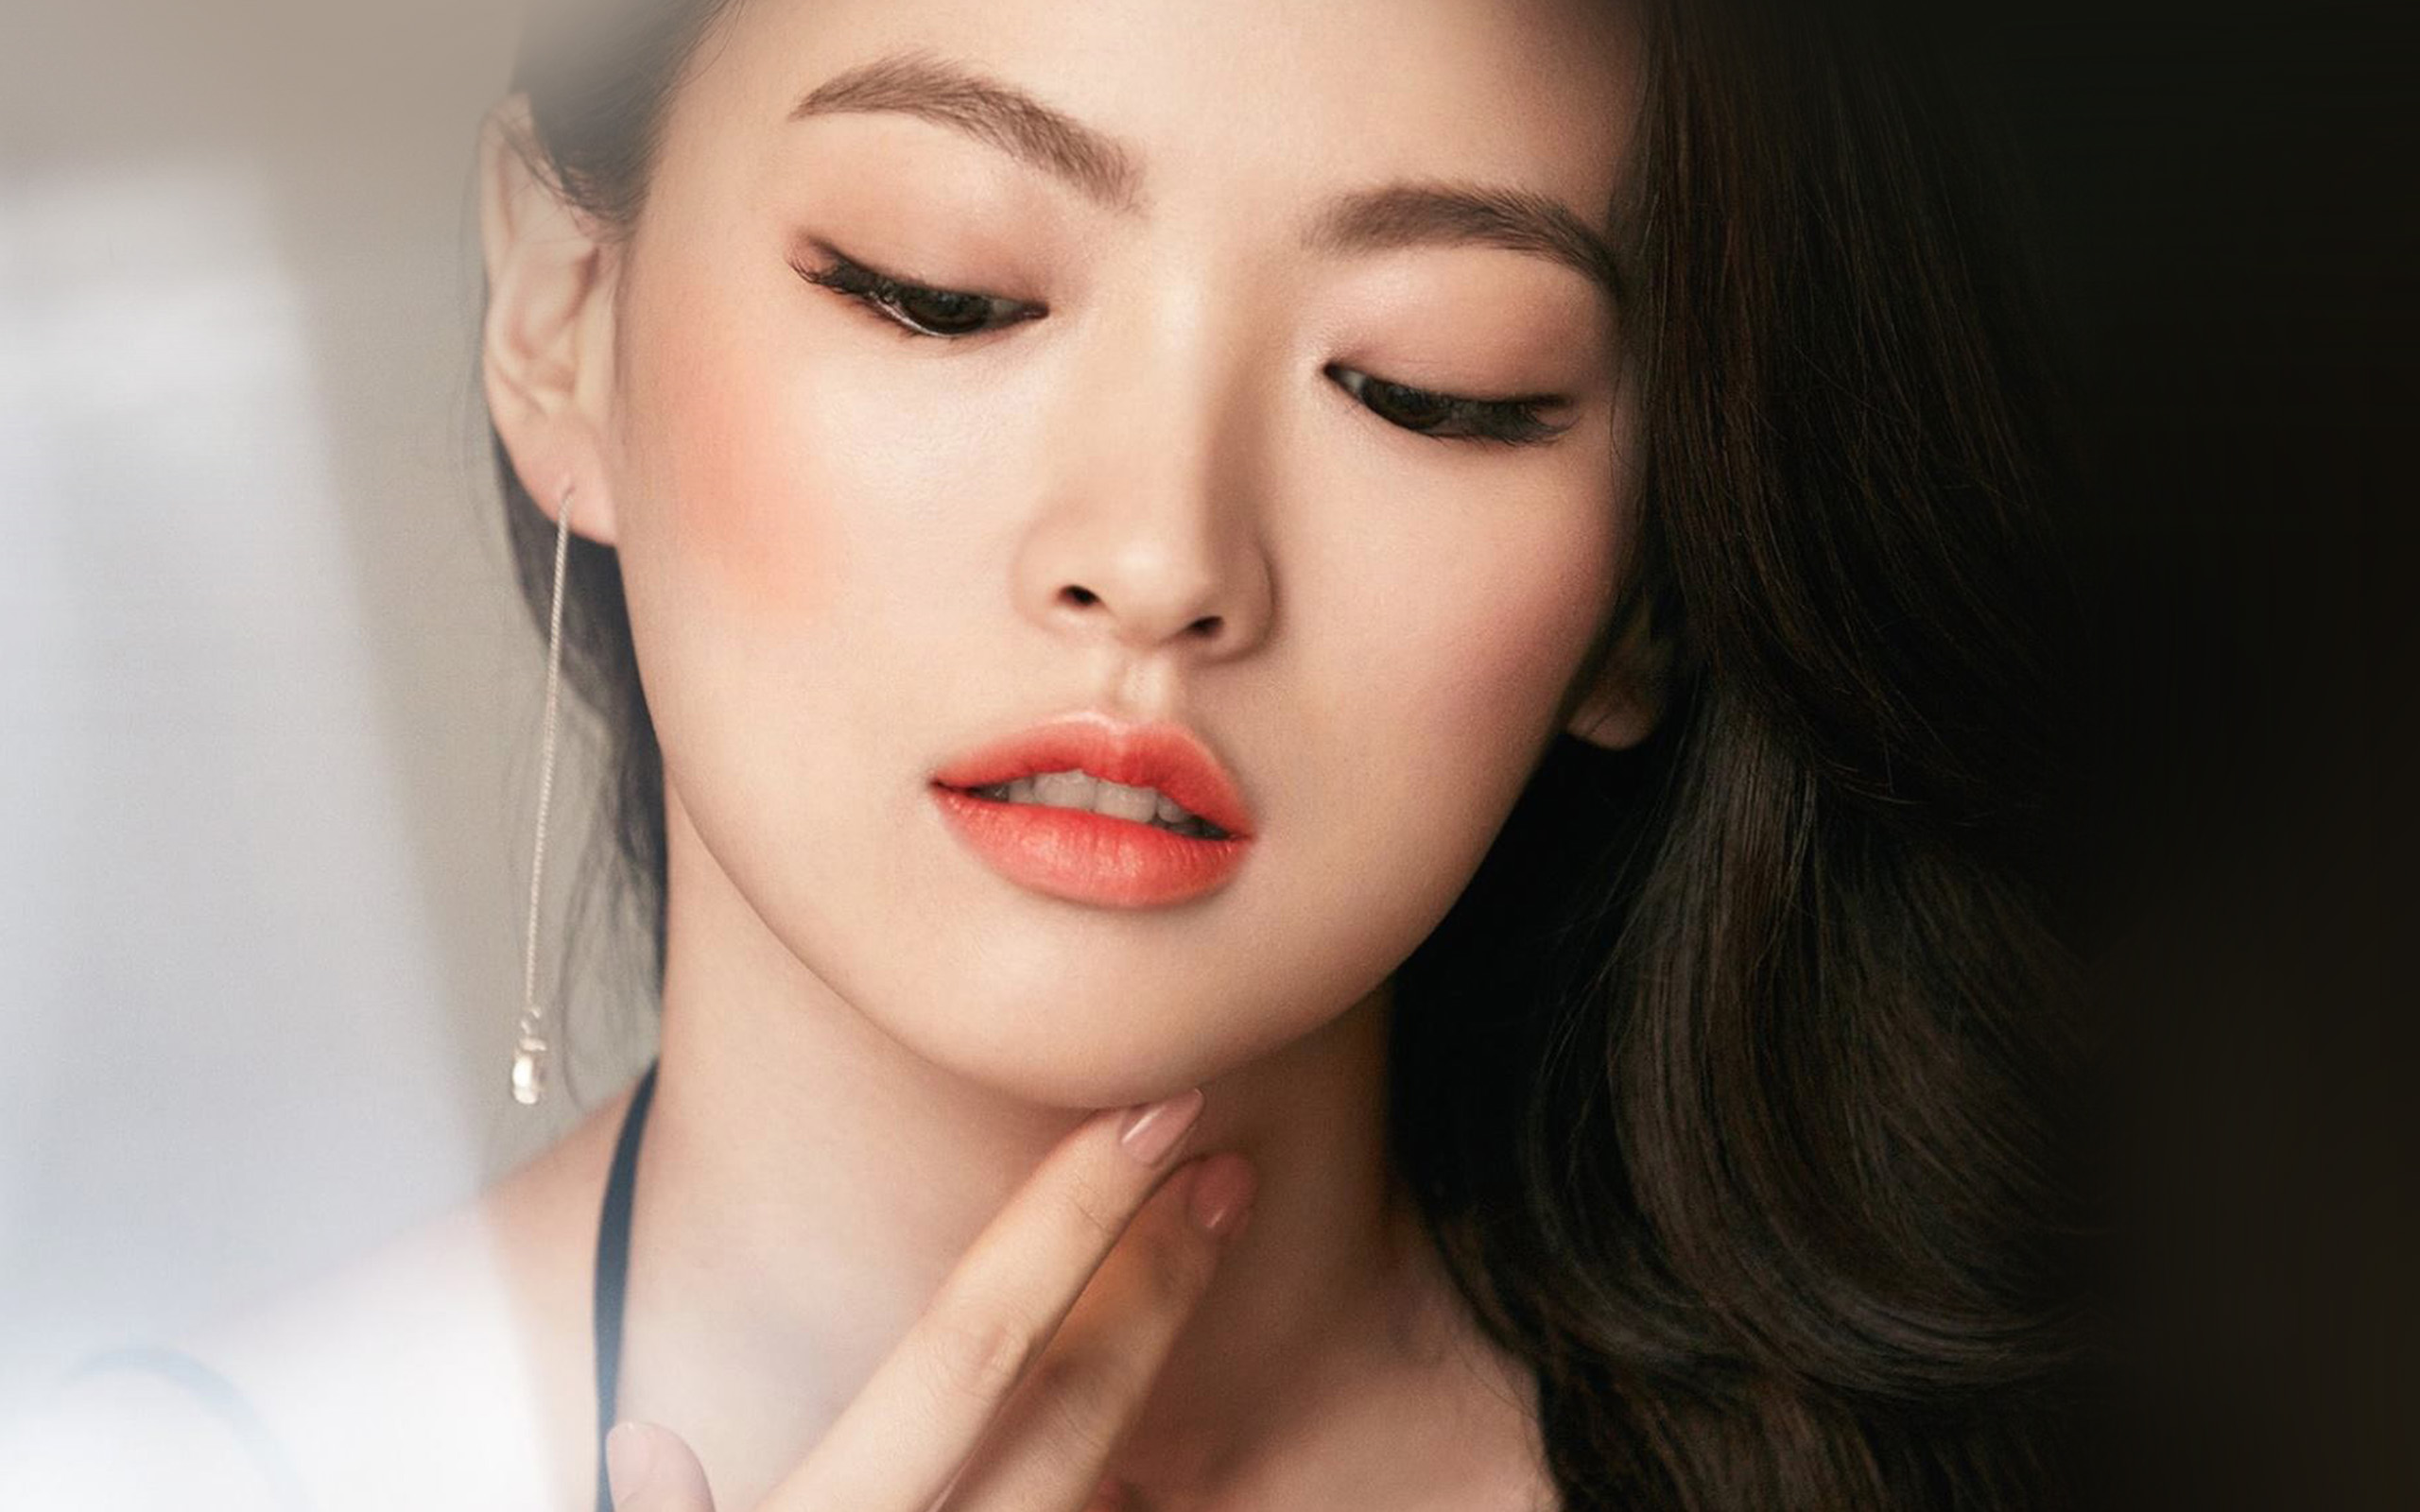 Beautiful Girl Face Hd Desktop Wallpaper Hn65 Asian Girl Face Dark Dress Wallpaper